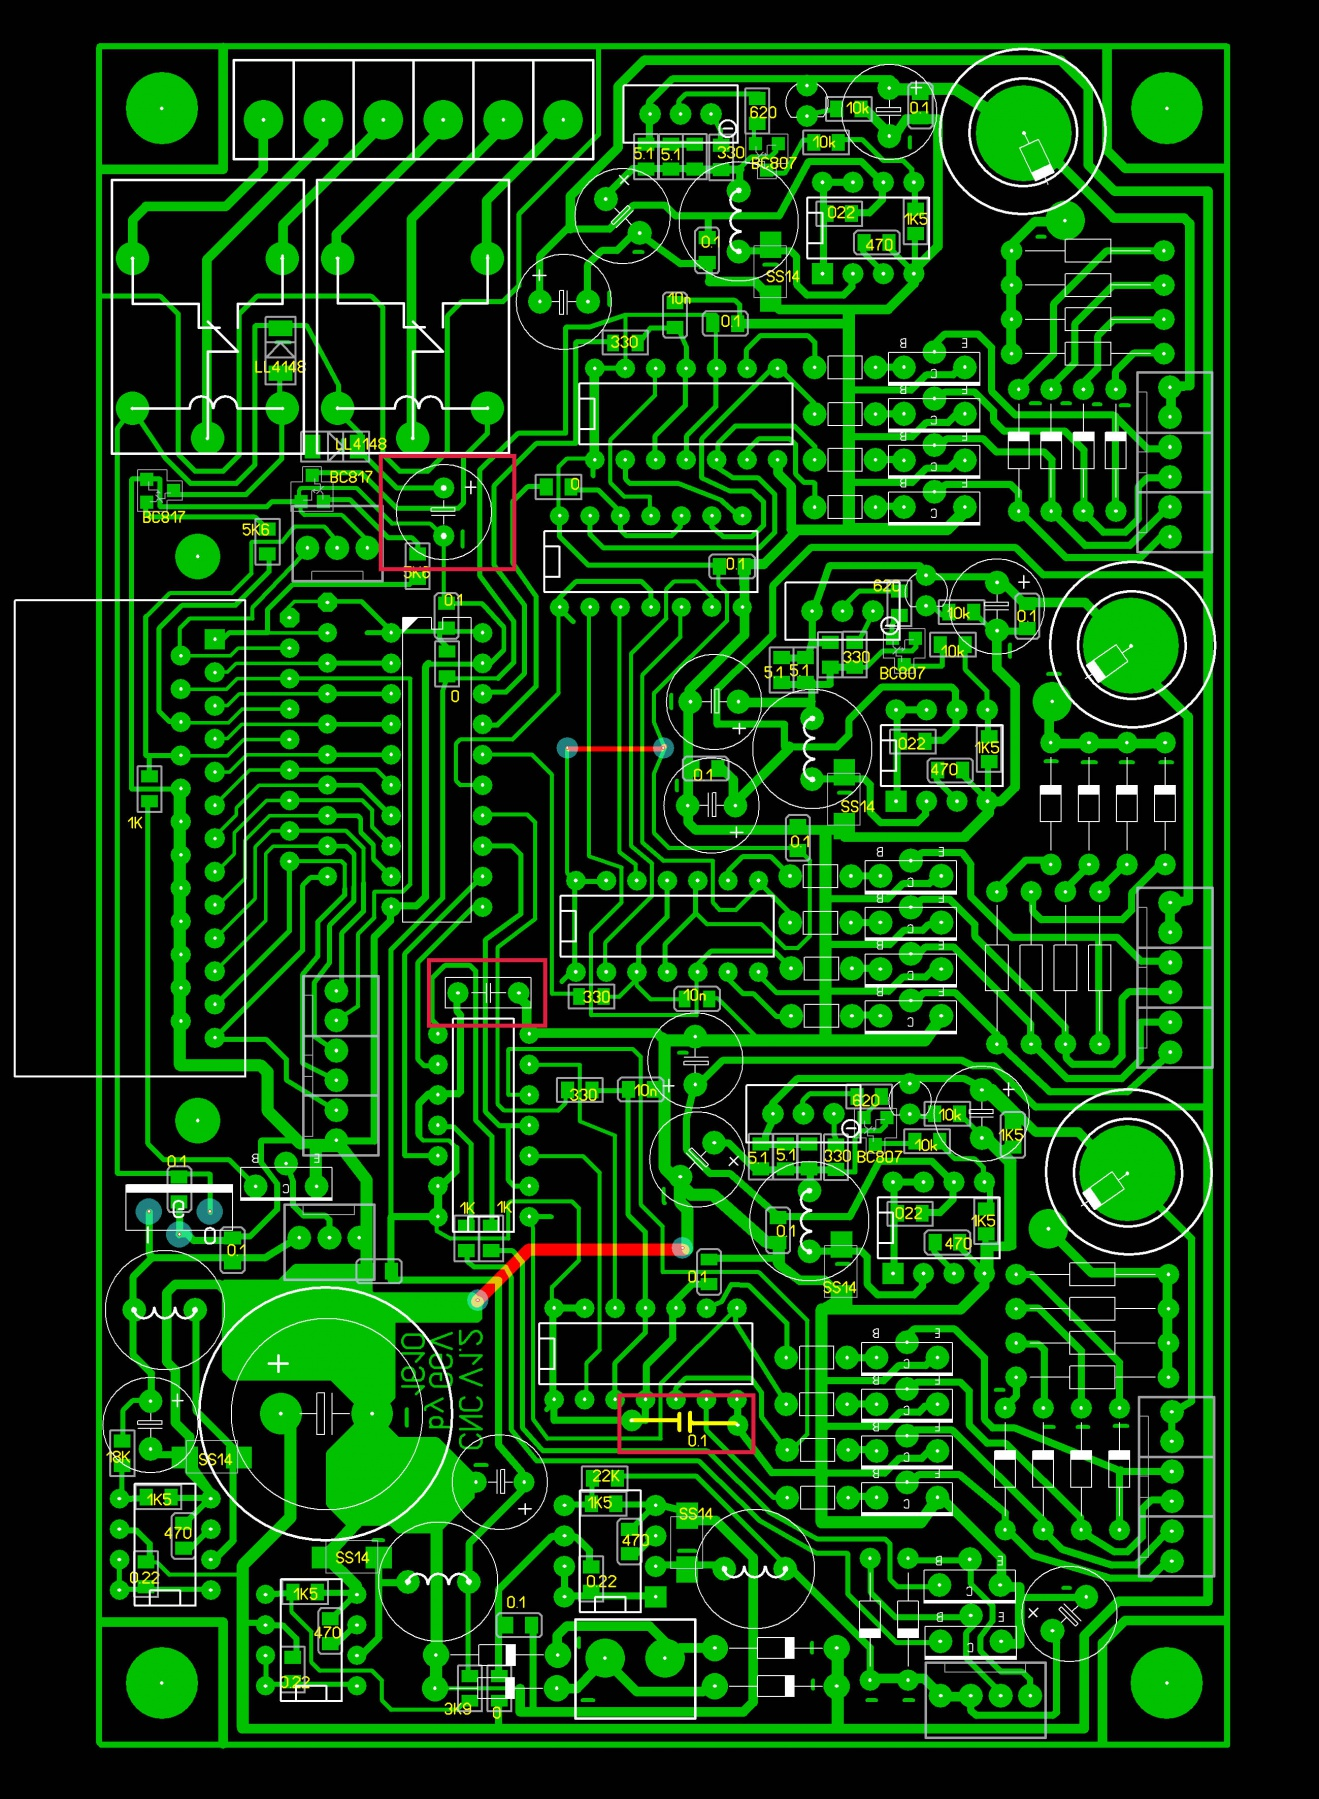 схема контроллера станка чпу на uln2003